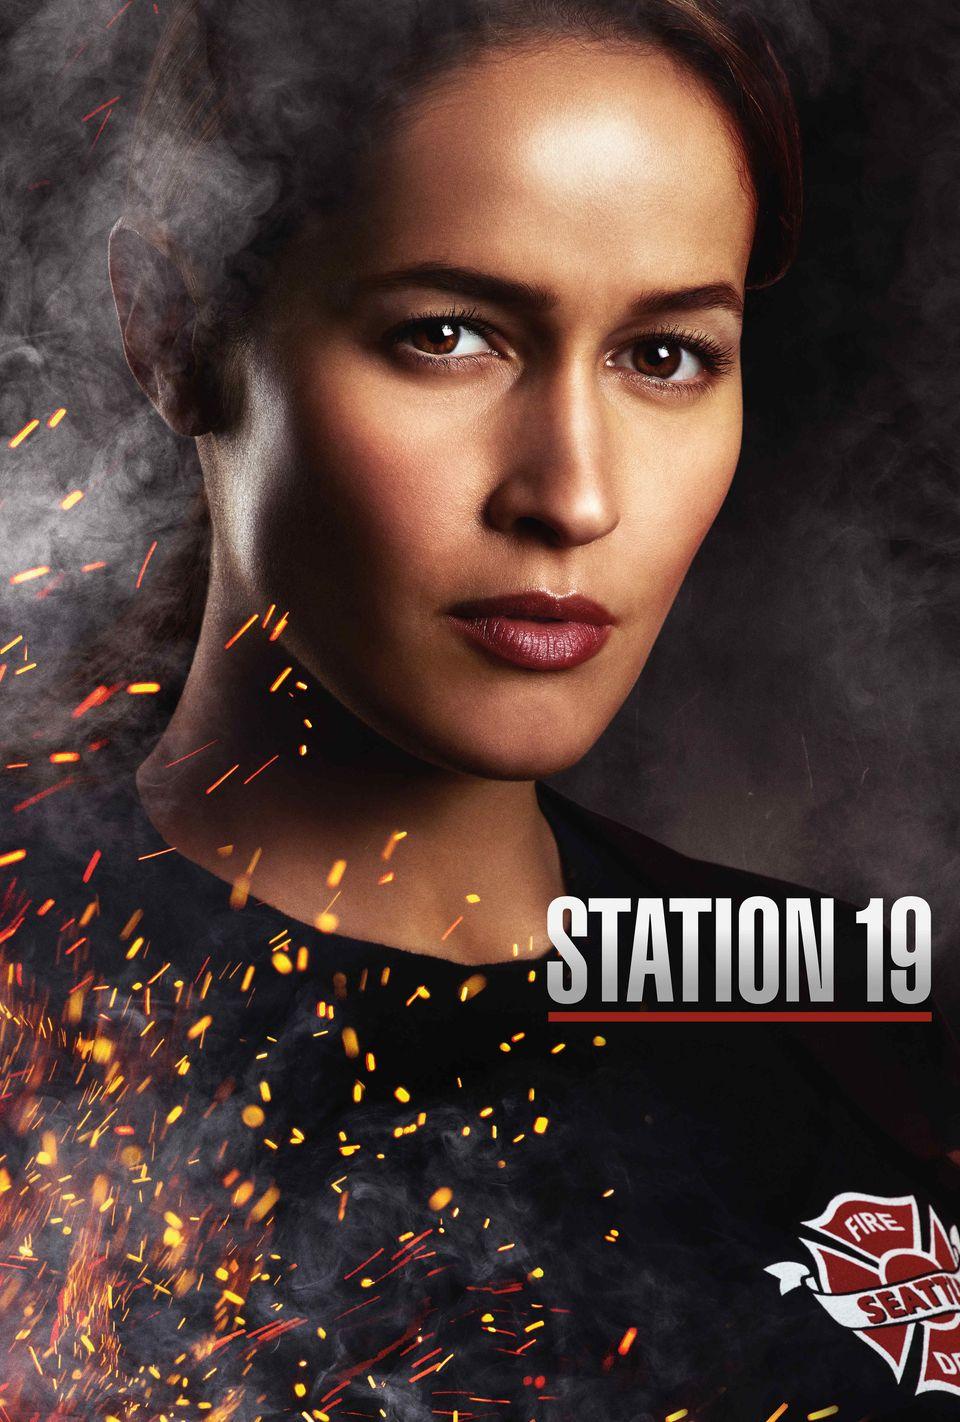 STATION 19 ทีมแกร่งนักผจญเพลิง ปี 2 (STATION 19 YR 2)